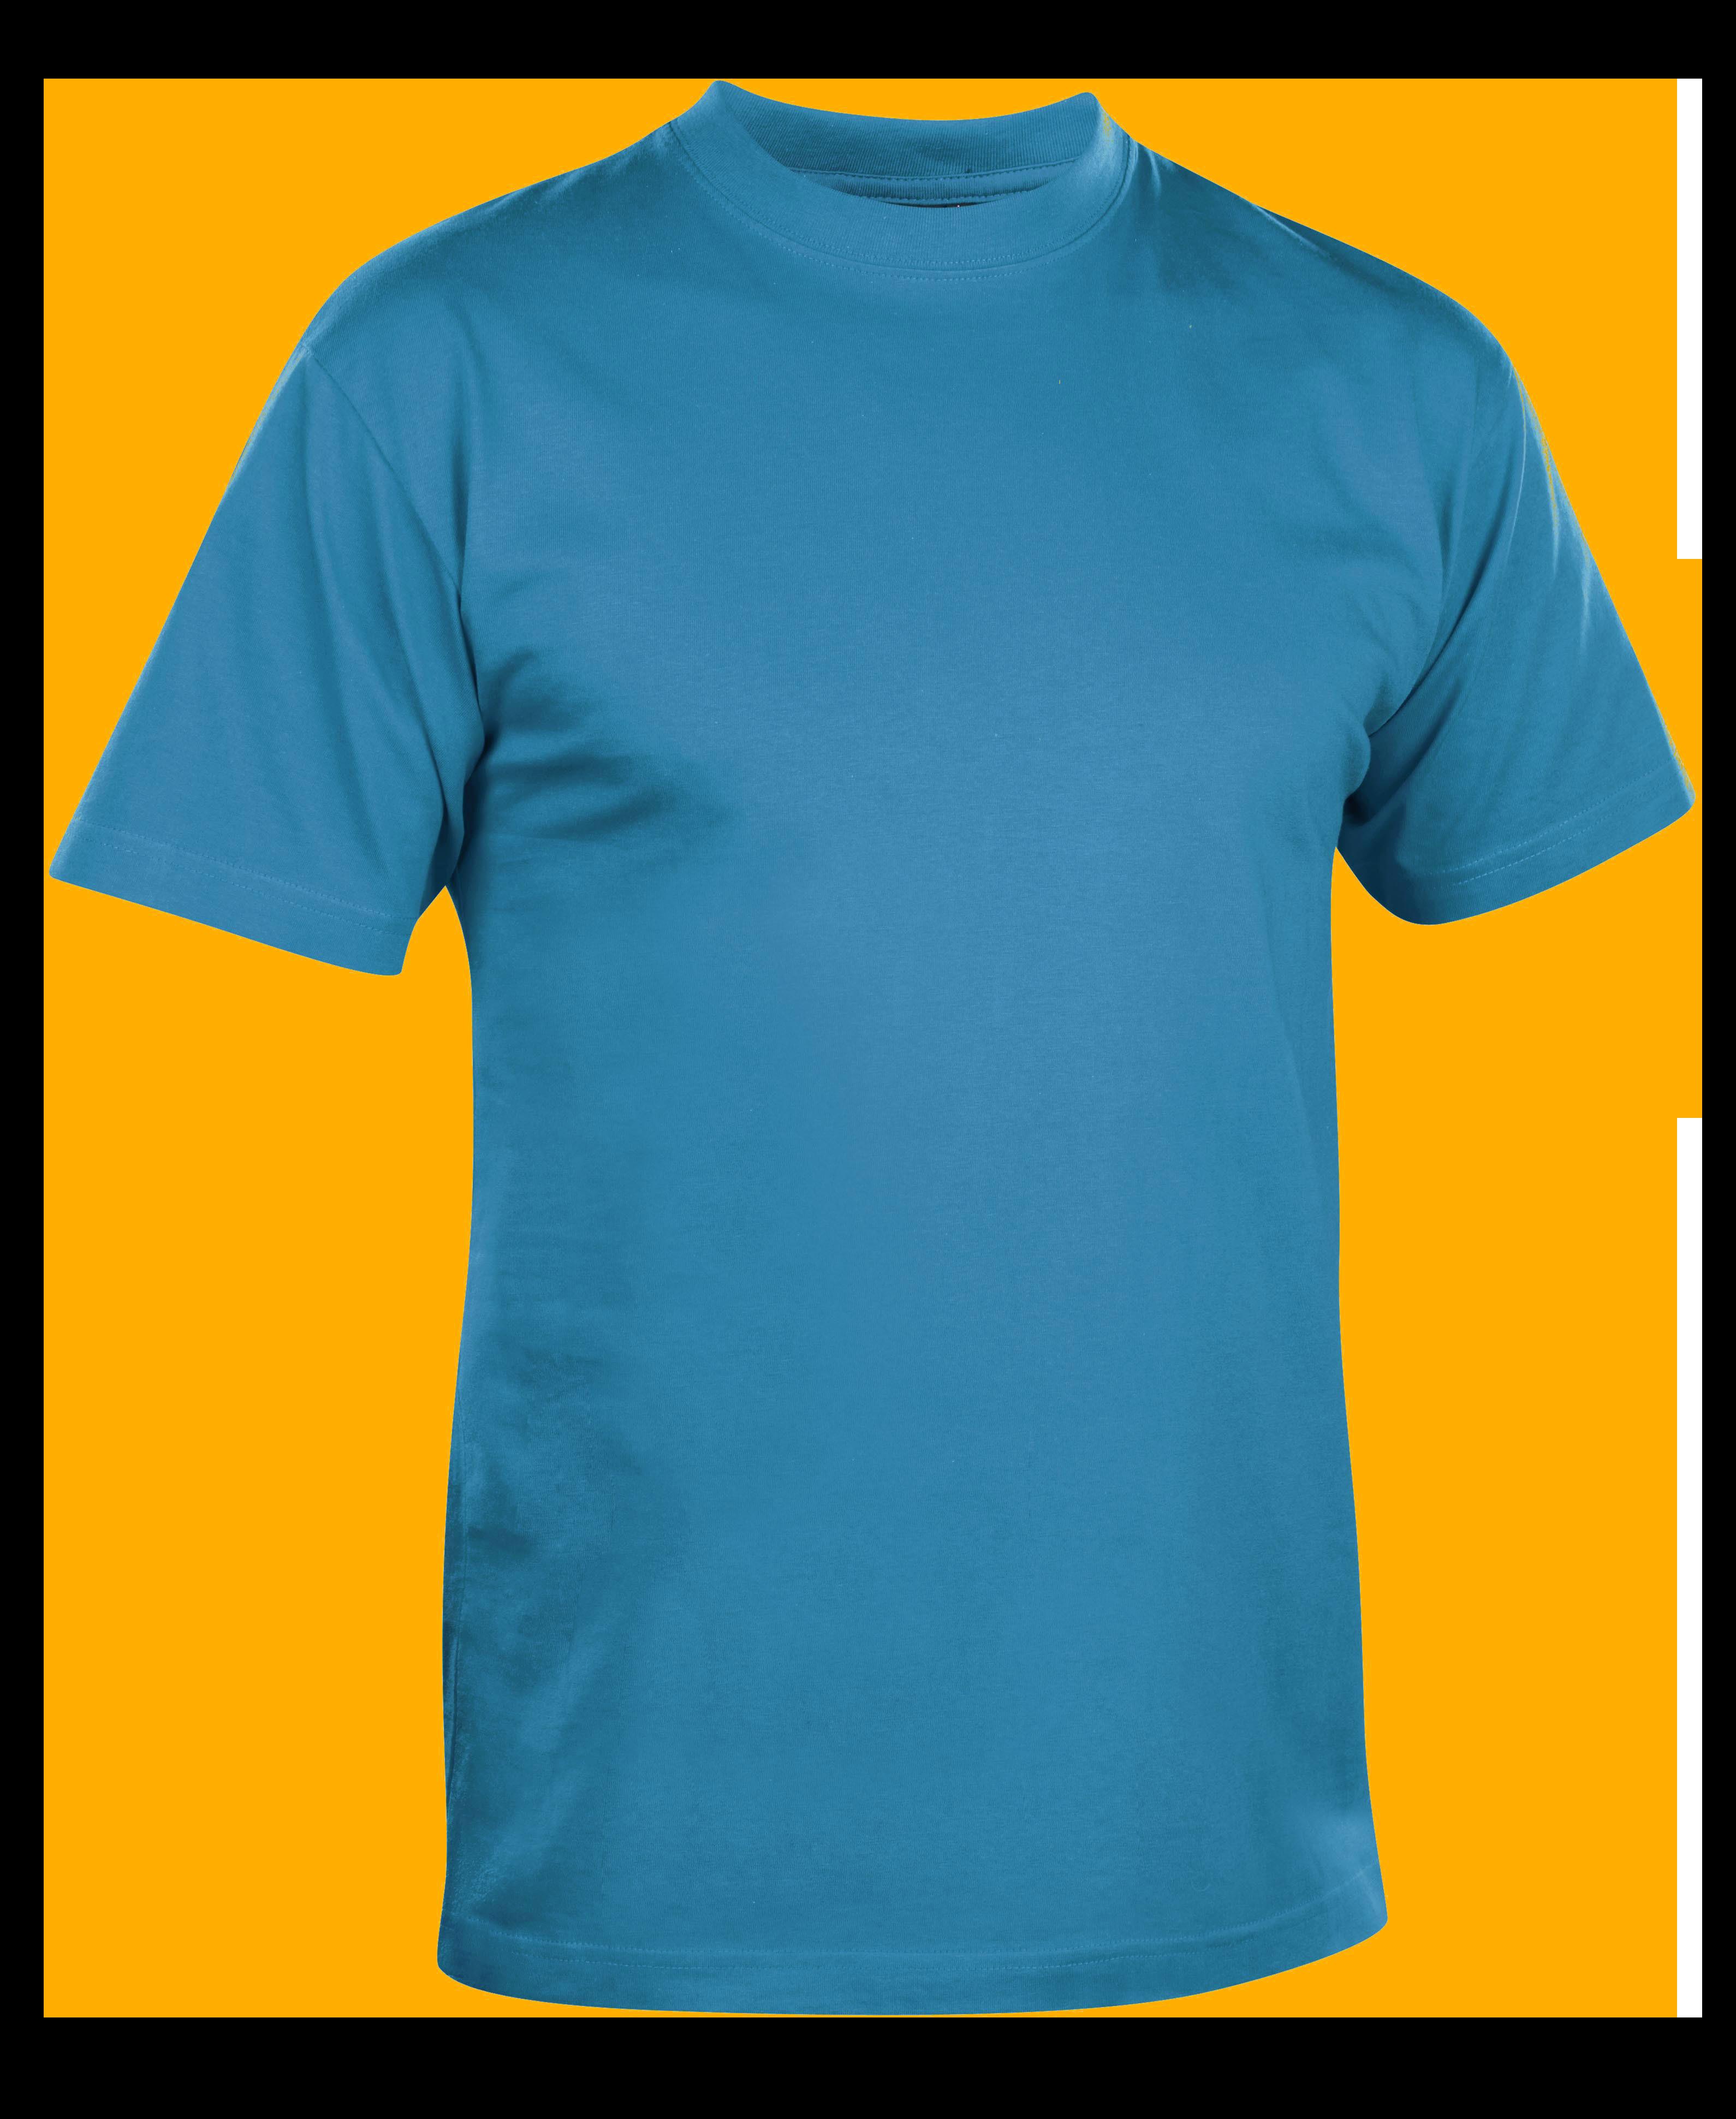 Sky Blue T Shirt Png Image Blue Tshirt Shirts T Shirt Image